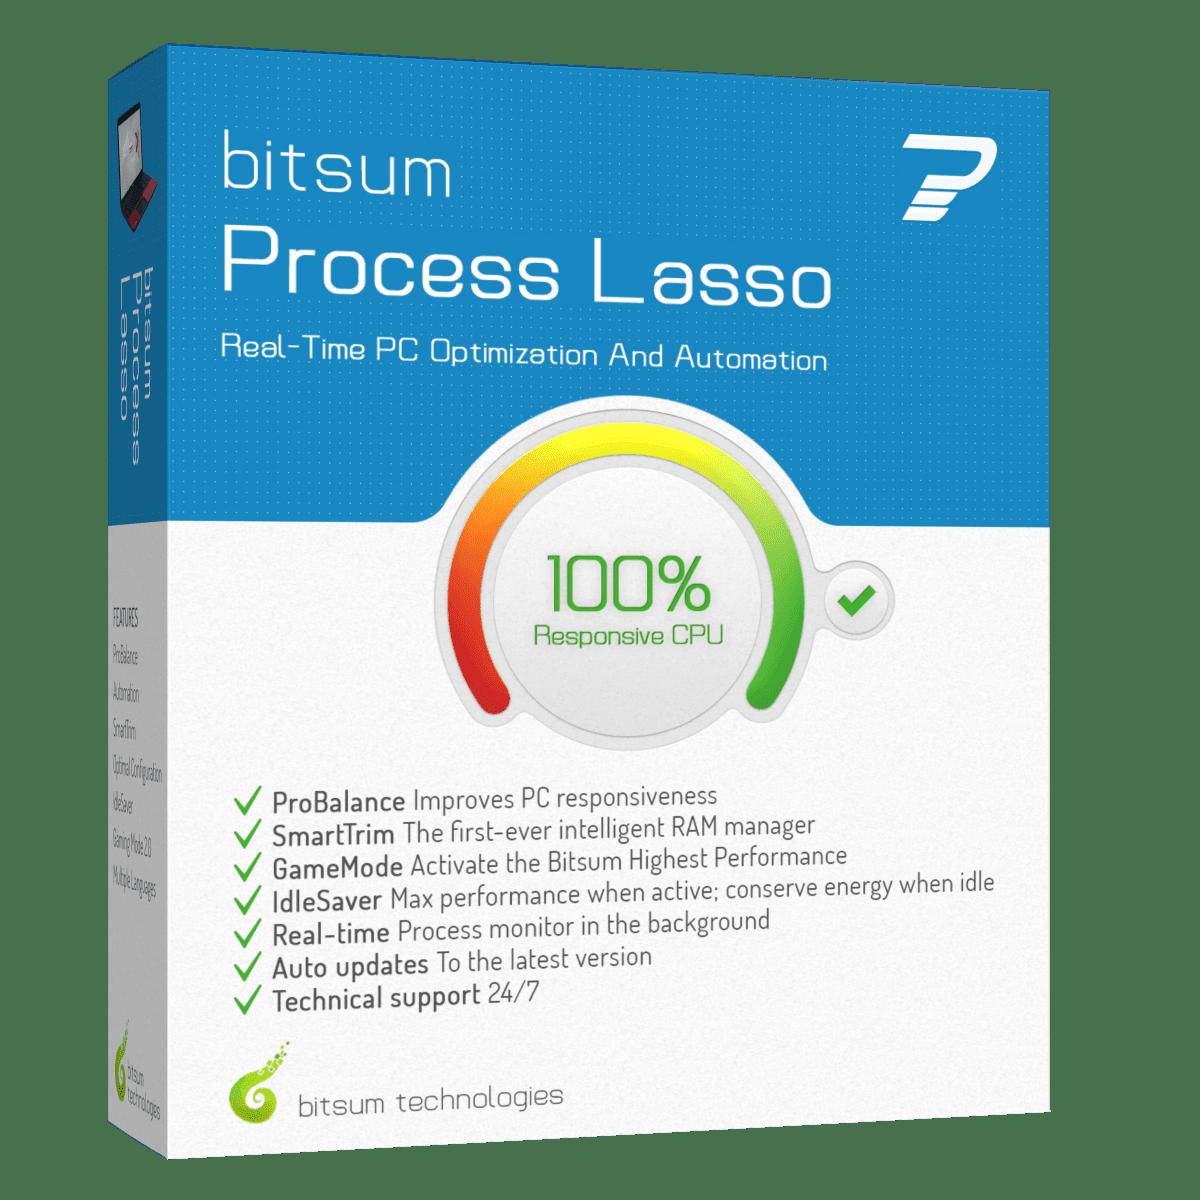 Bitsum Technologies Process Lasso Pro 9.0.0.368 poster box cover